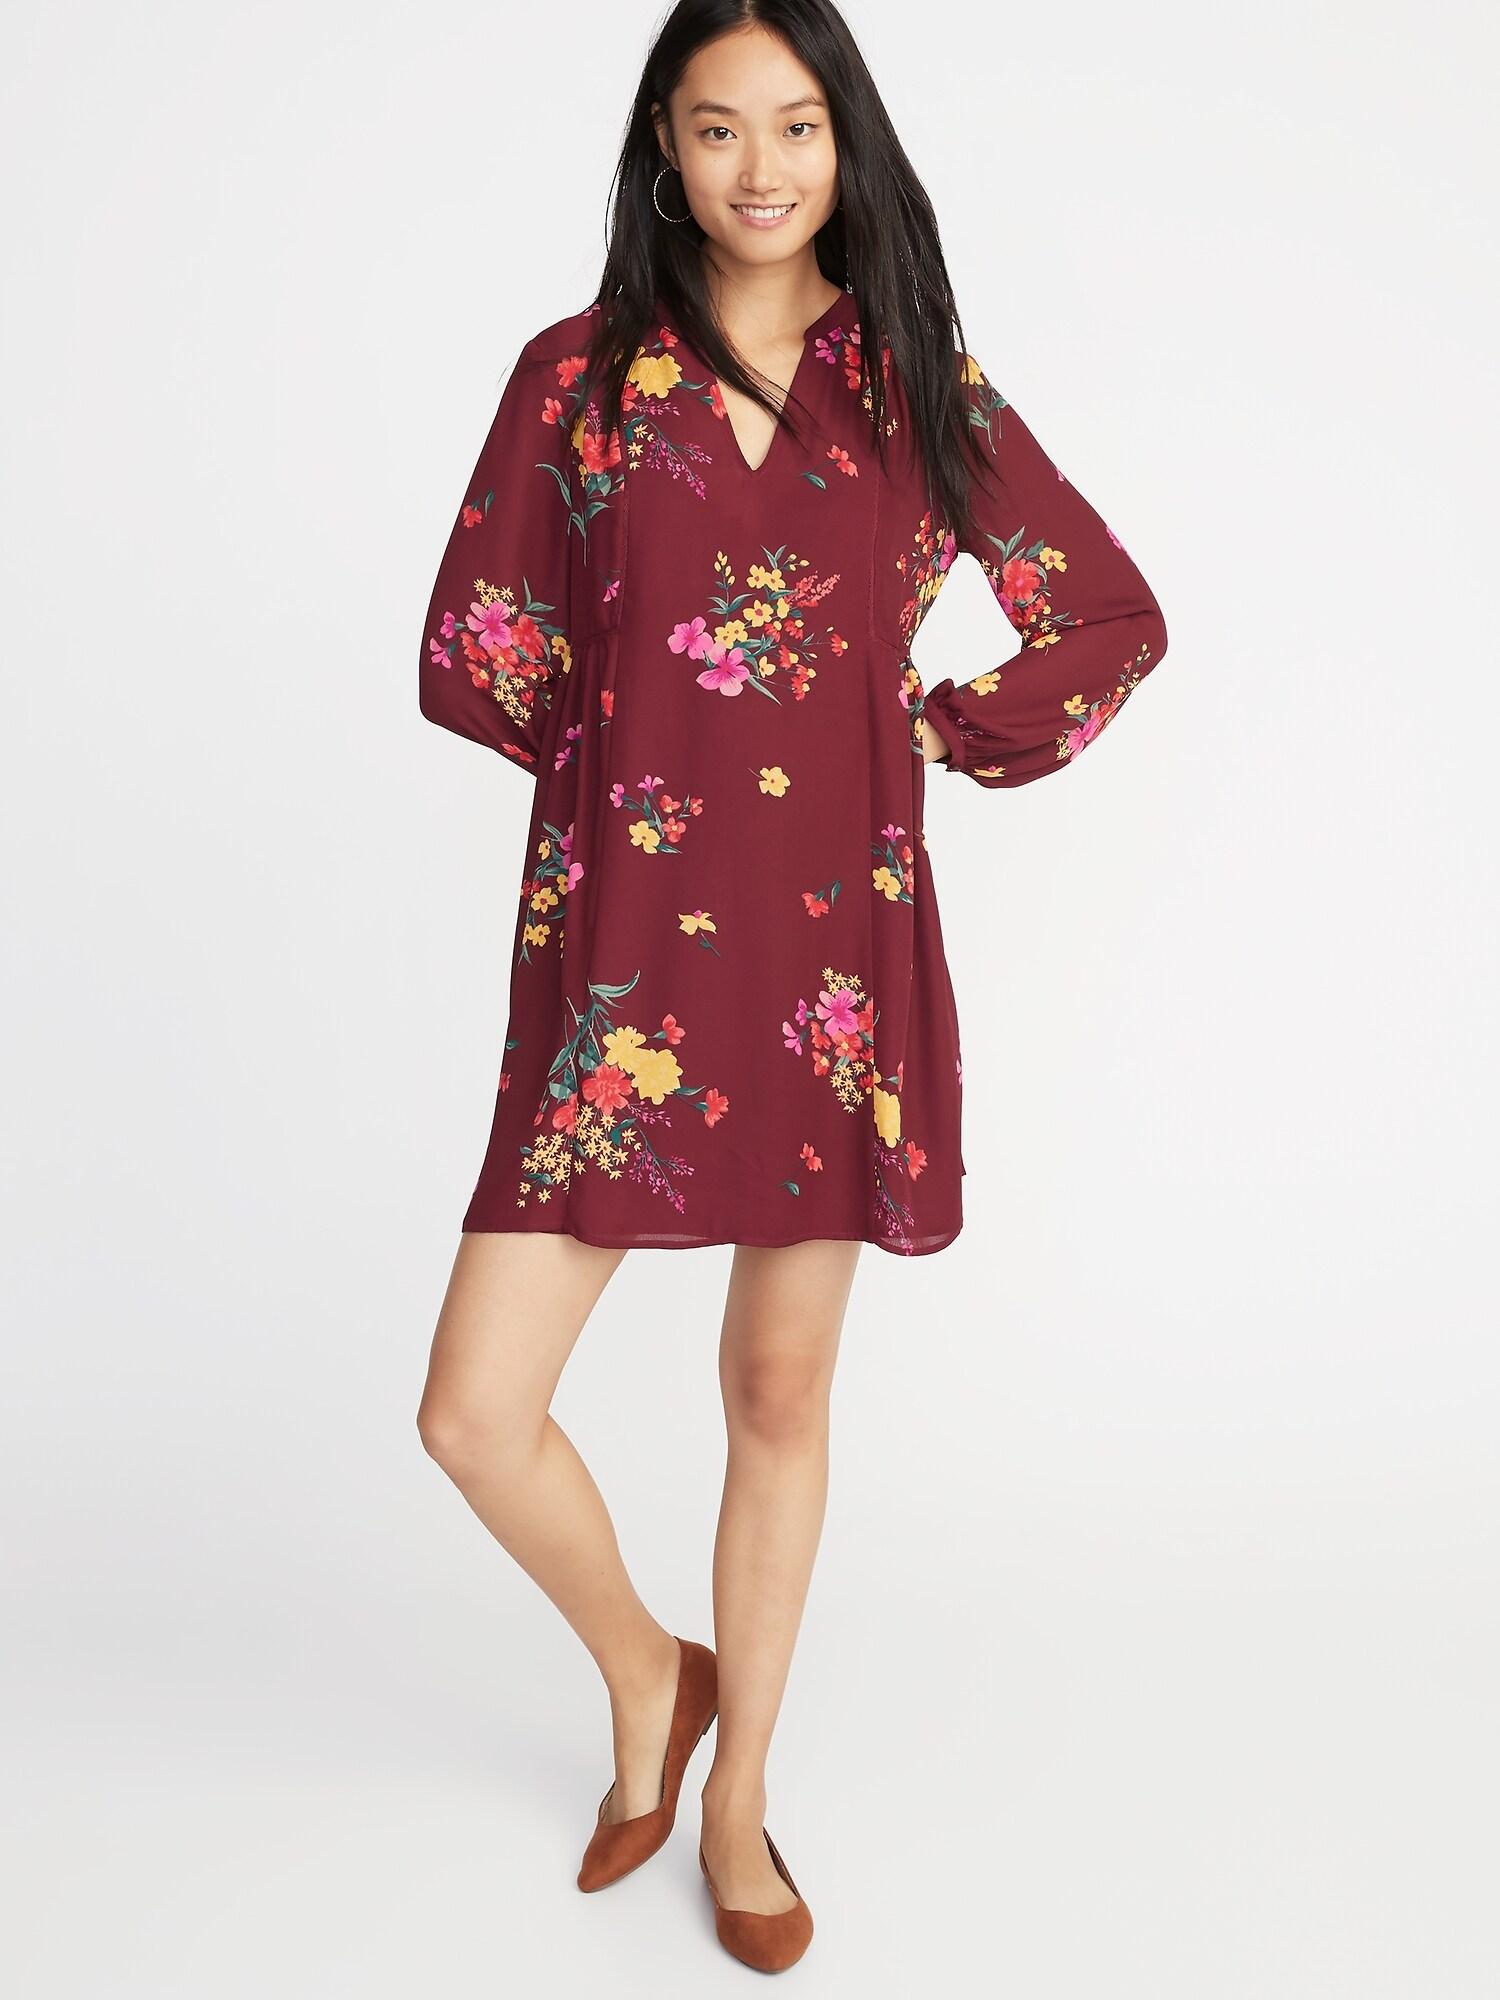 015c90de3d8 Floral-Print Georgette Swing Dress for Women